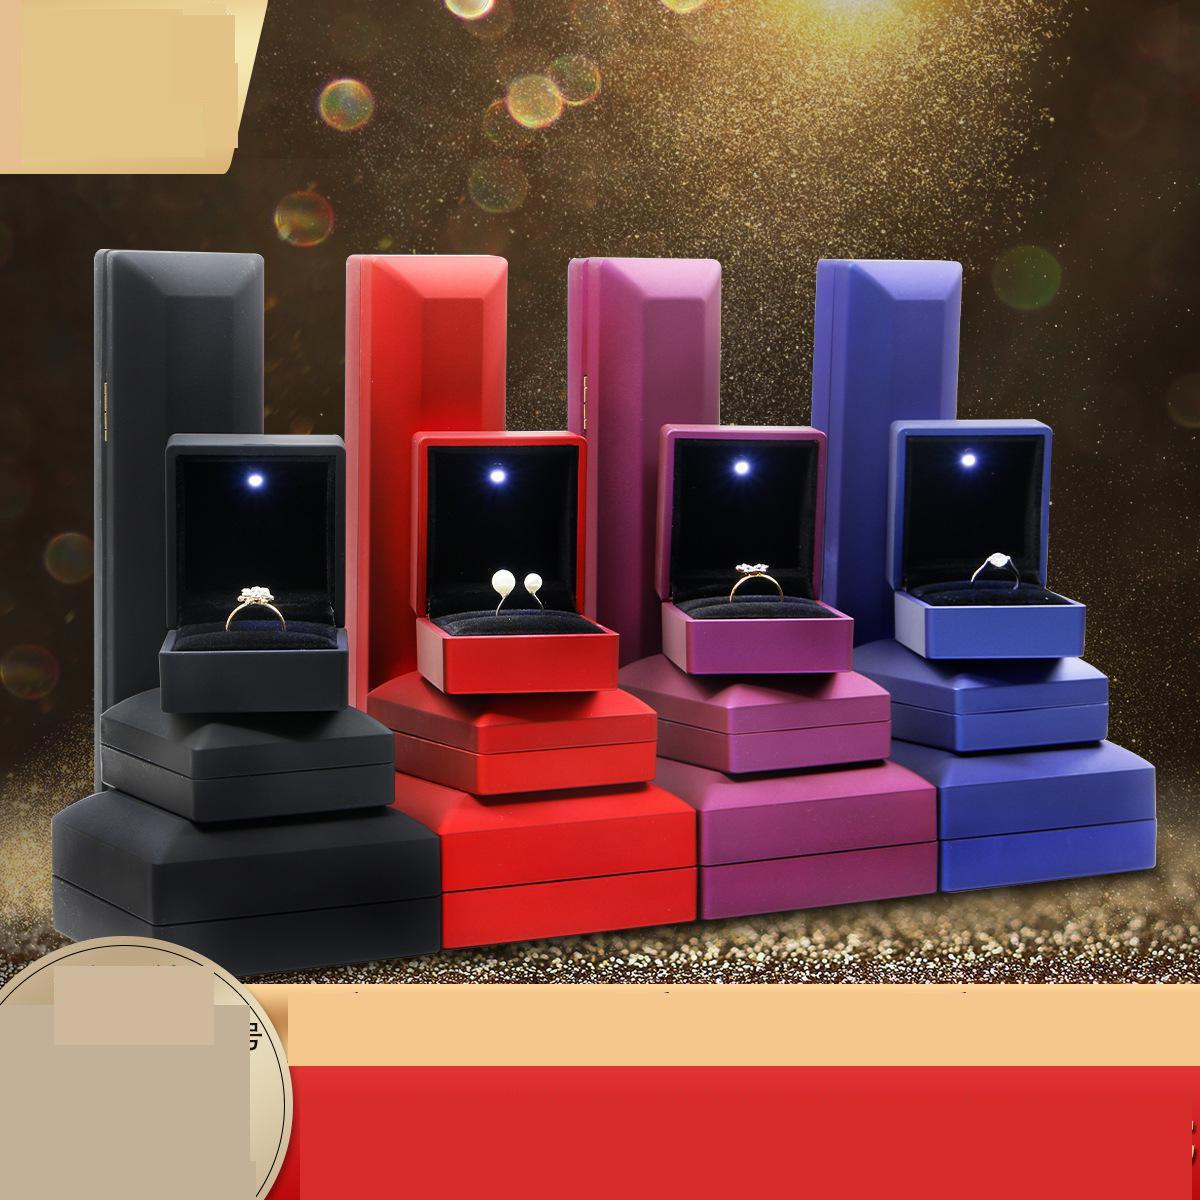 Nueva moda Led pendiente ligero collar anillos visualización joyero personalizado de lujo anillo de boda baratija joyeria caja de embalaje